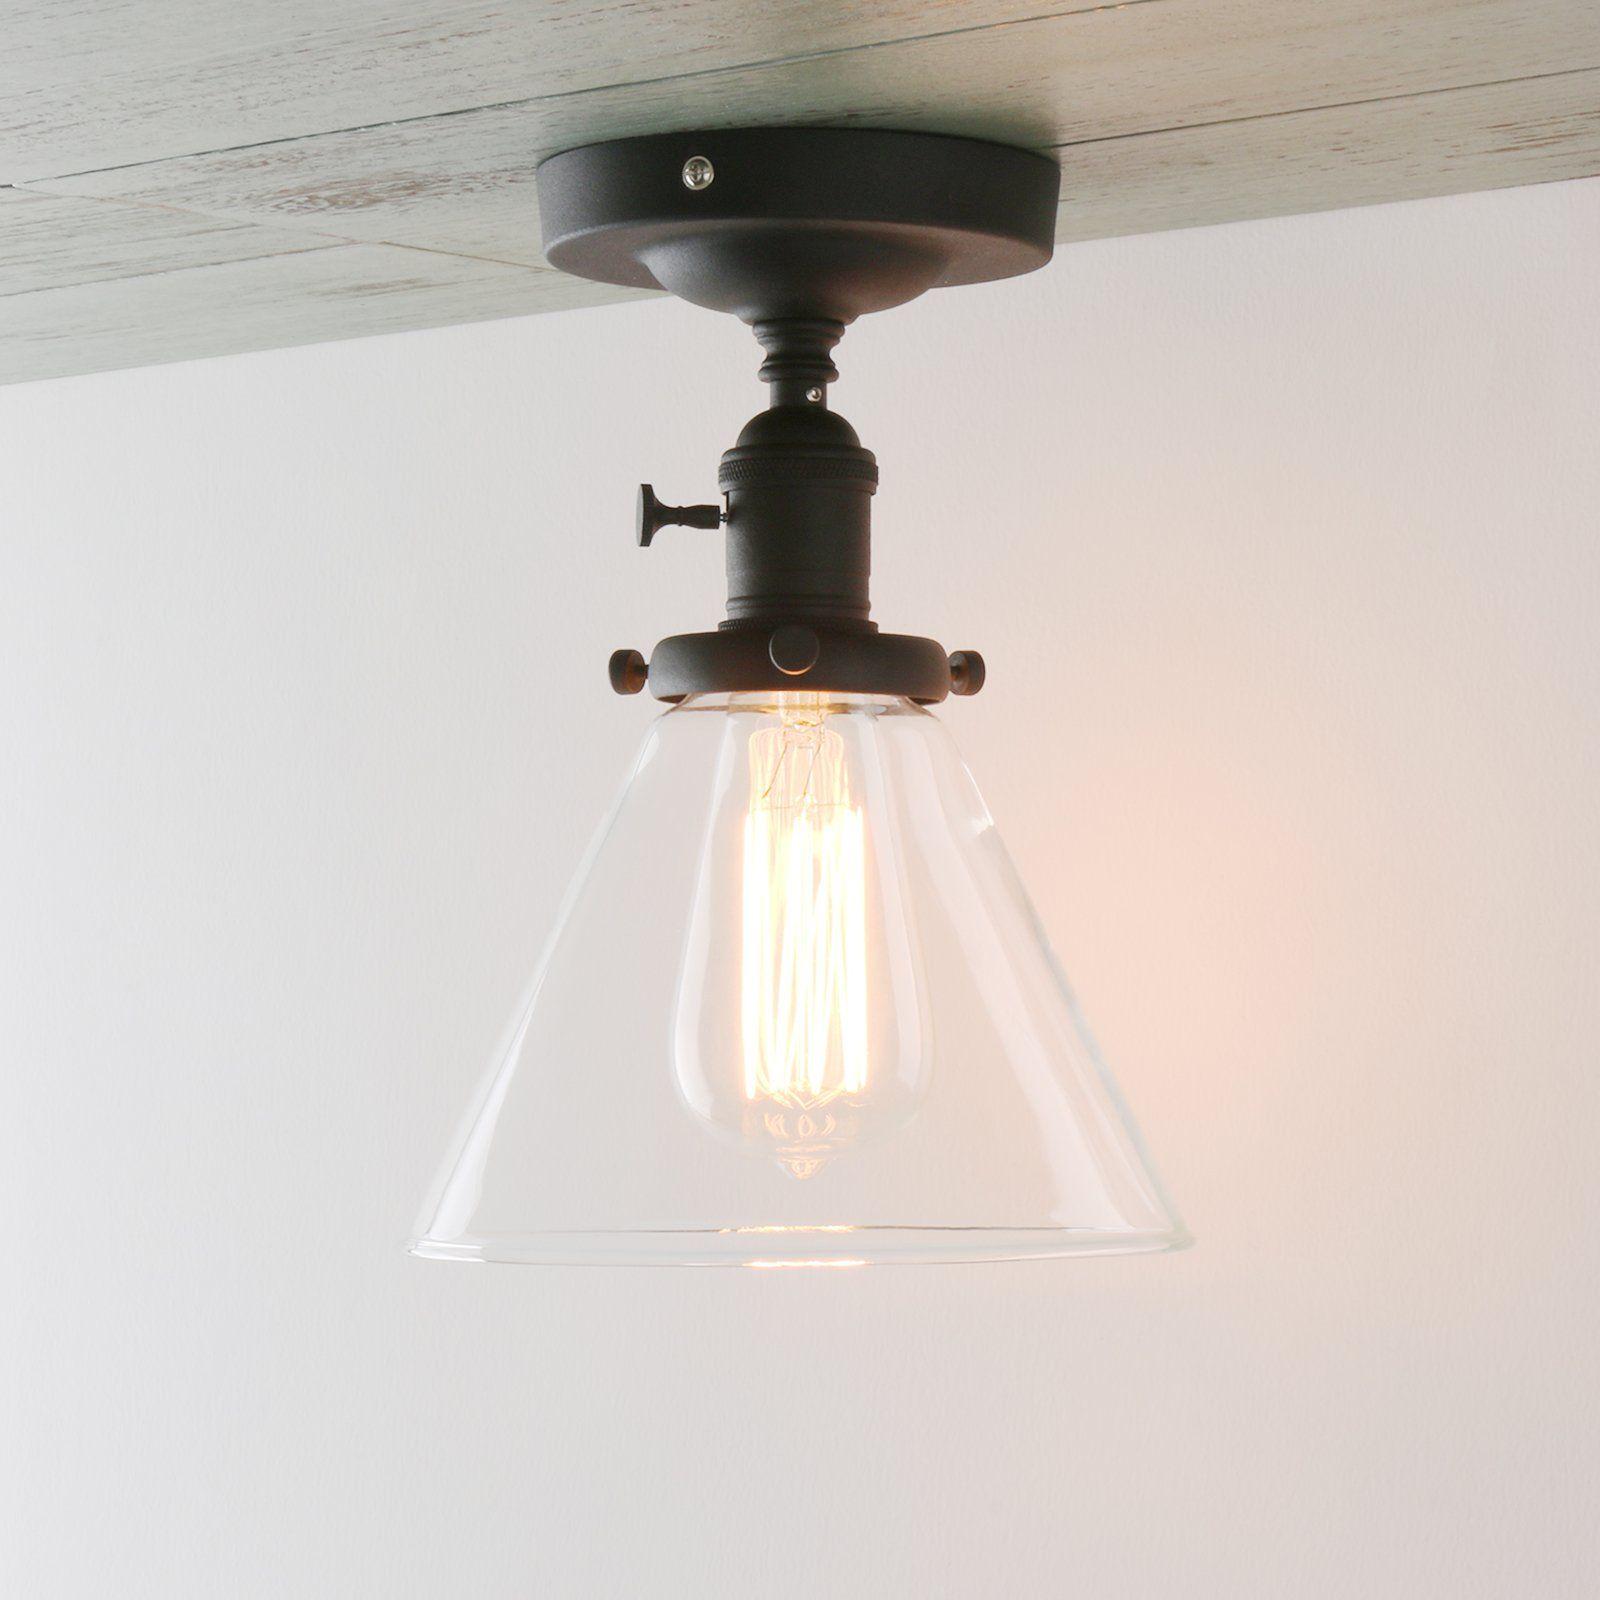 Permo Vintage Industrial Semi Flush Mount Ceiling Light Fixture Pendant Lig Flush Mount Ceiling Lights Flush Mount Ceiling Light Fixtures Bedroom Ceiling Light